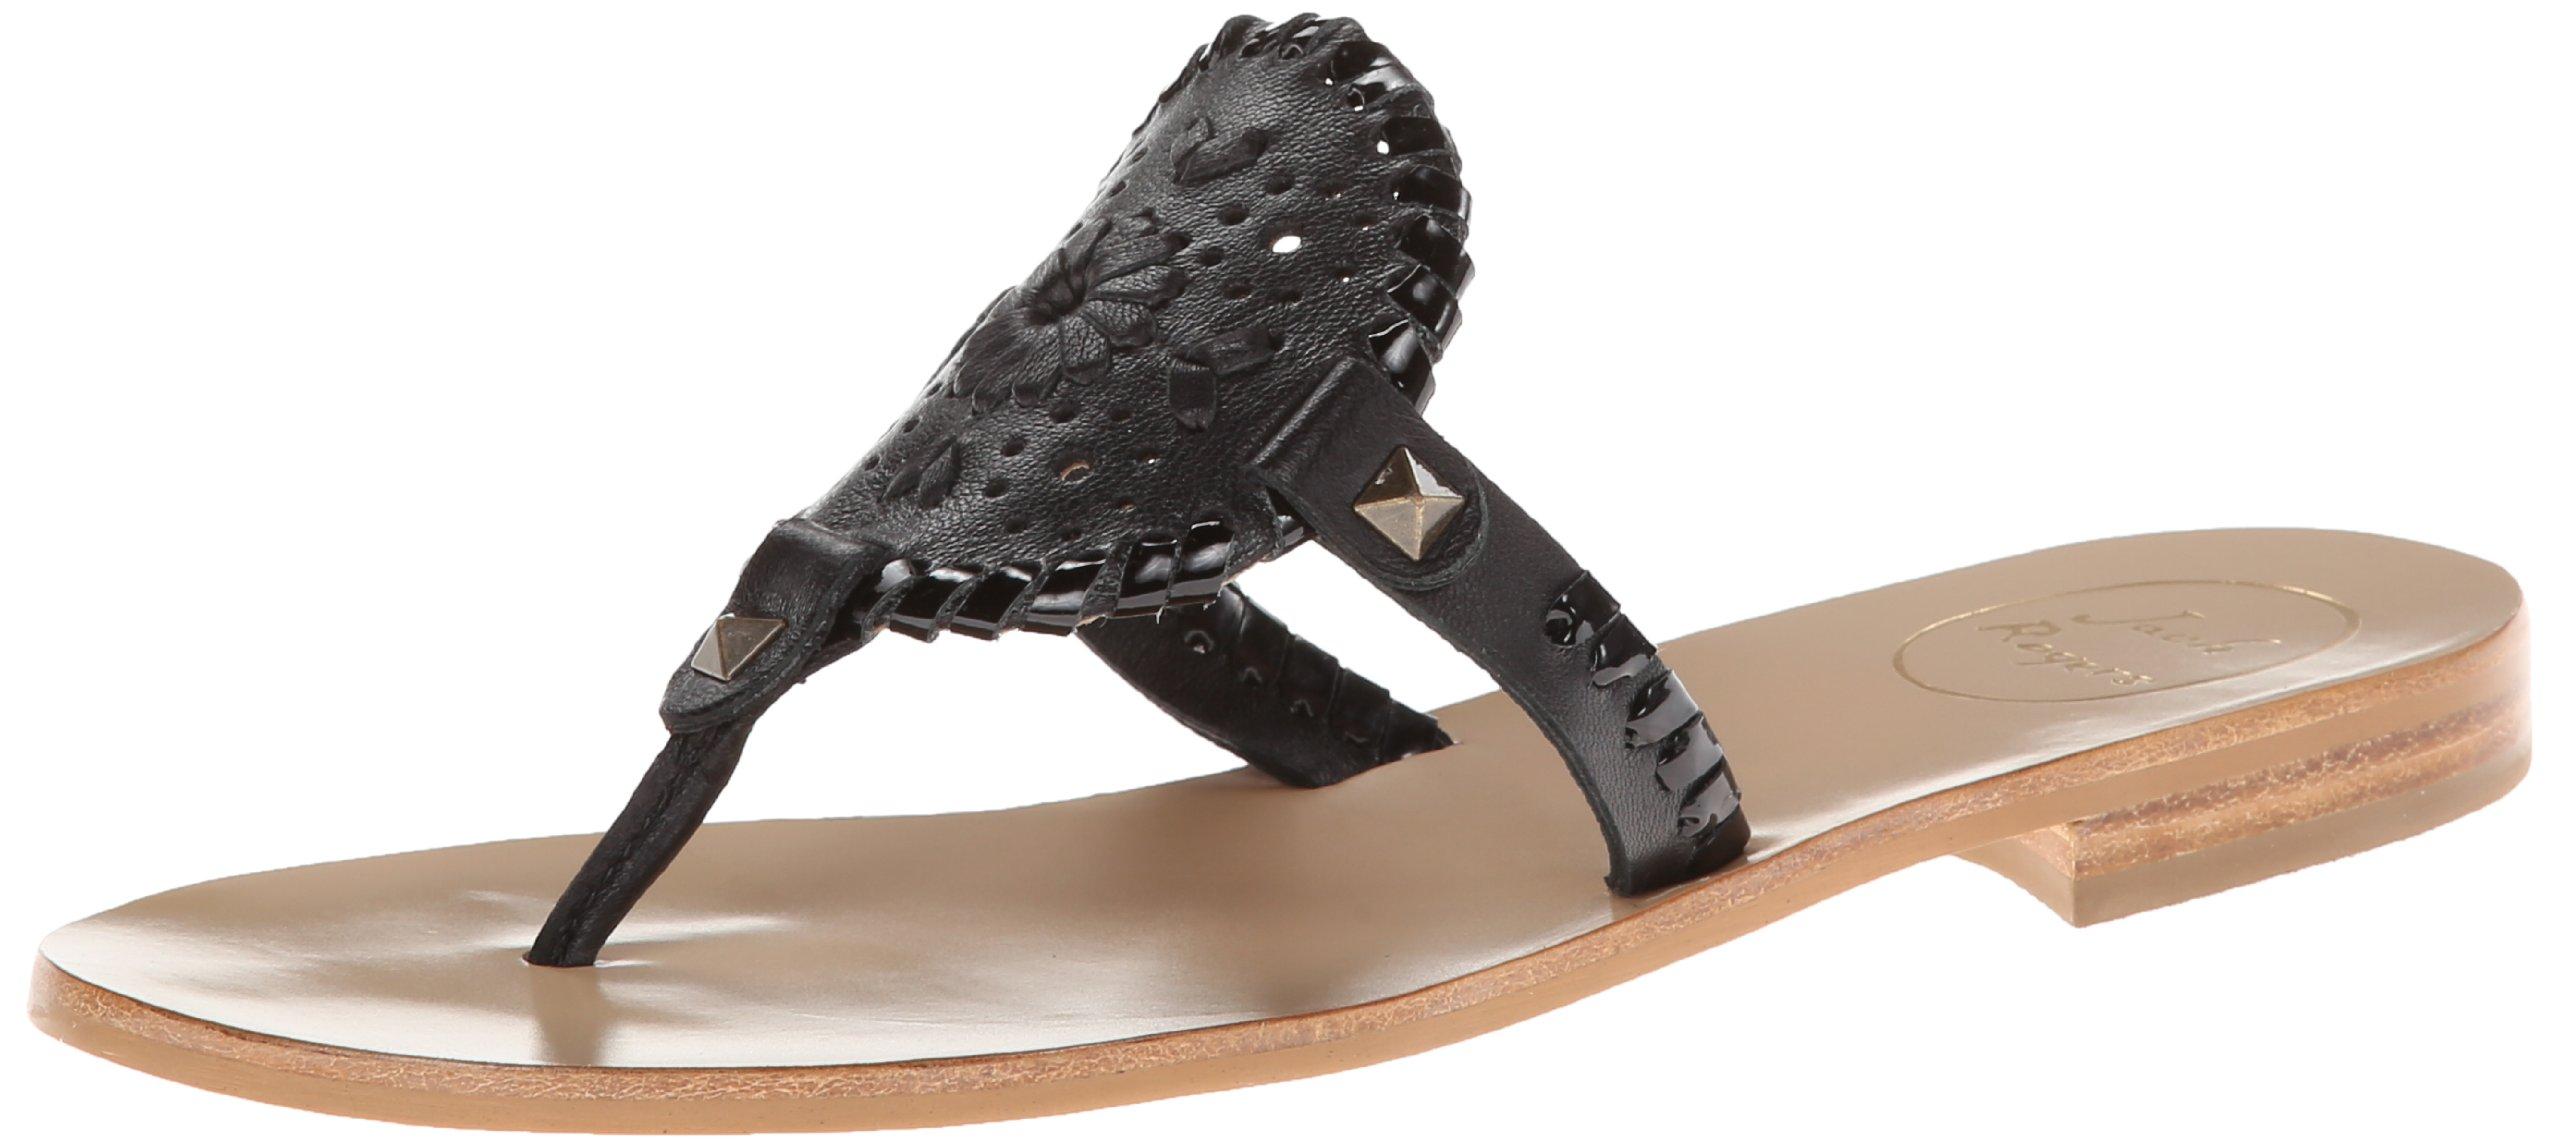 Jack Rogers Women's Georgica Sandal,Black/Black Patent,7 M US by Jack Rogers (Image #1)